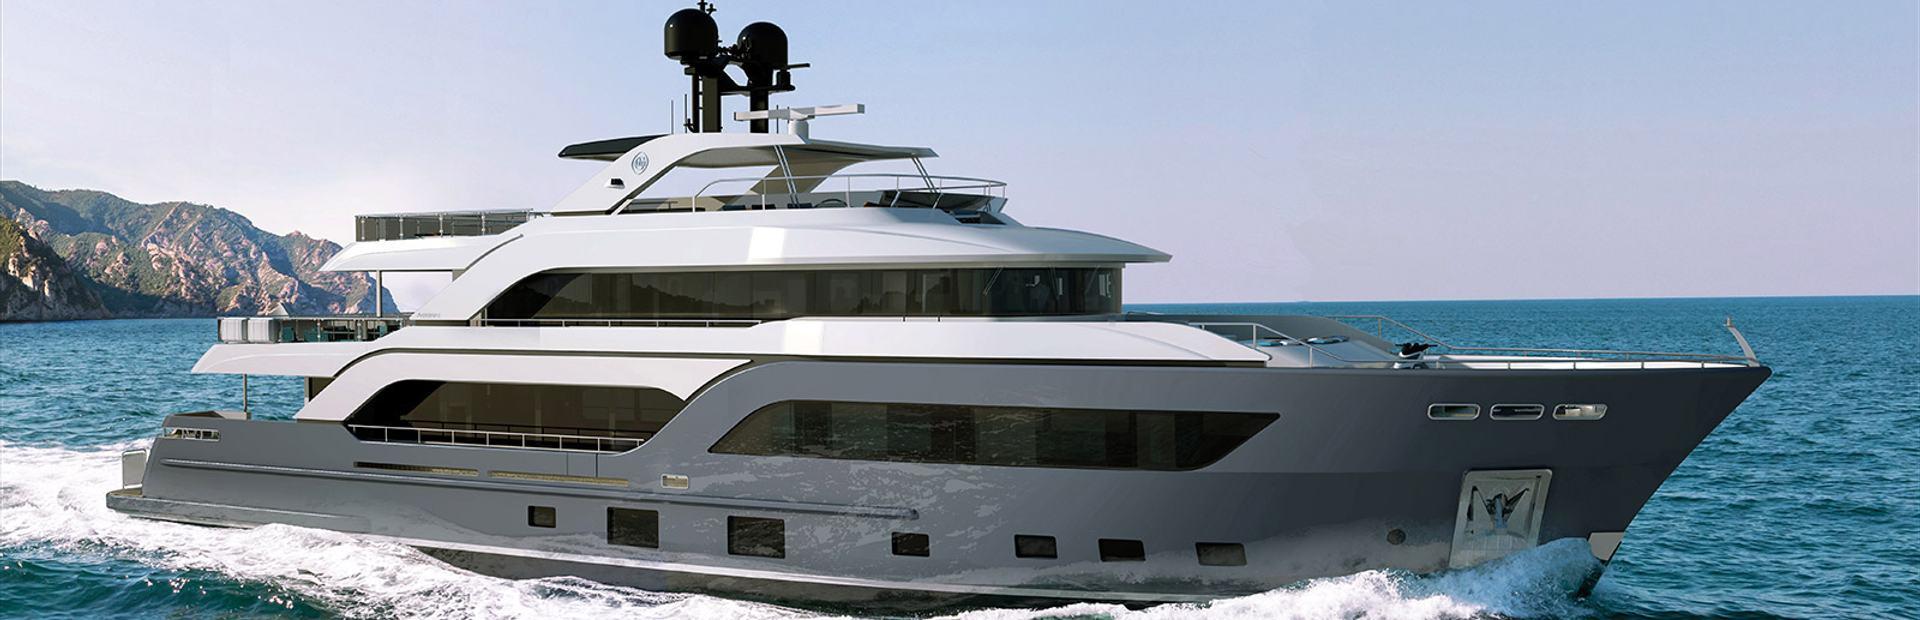 Cantiere Delle Marche Acciaio 123 Yacht Charter